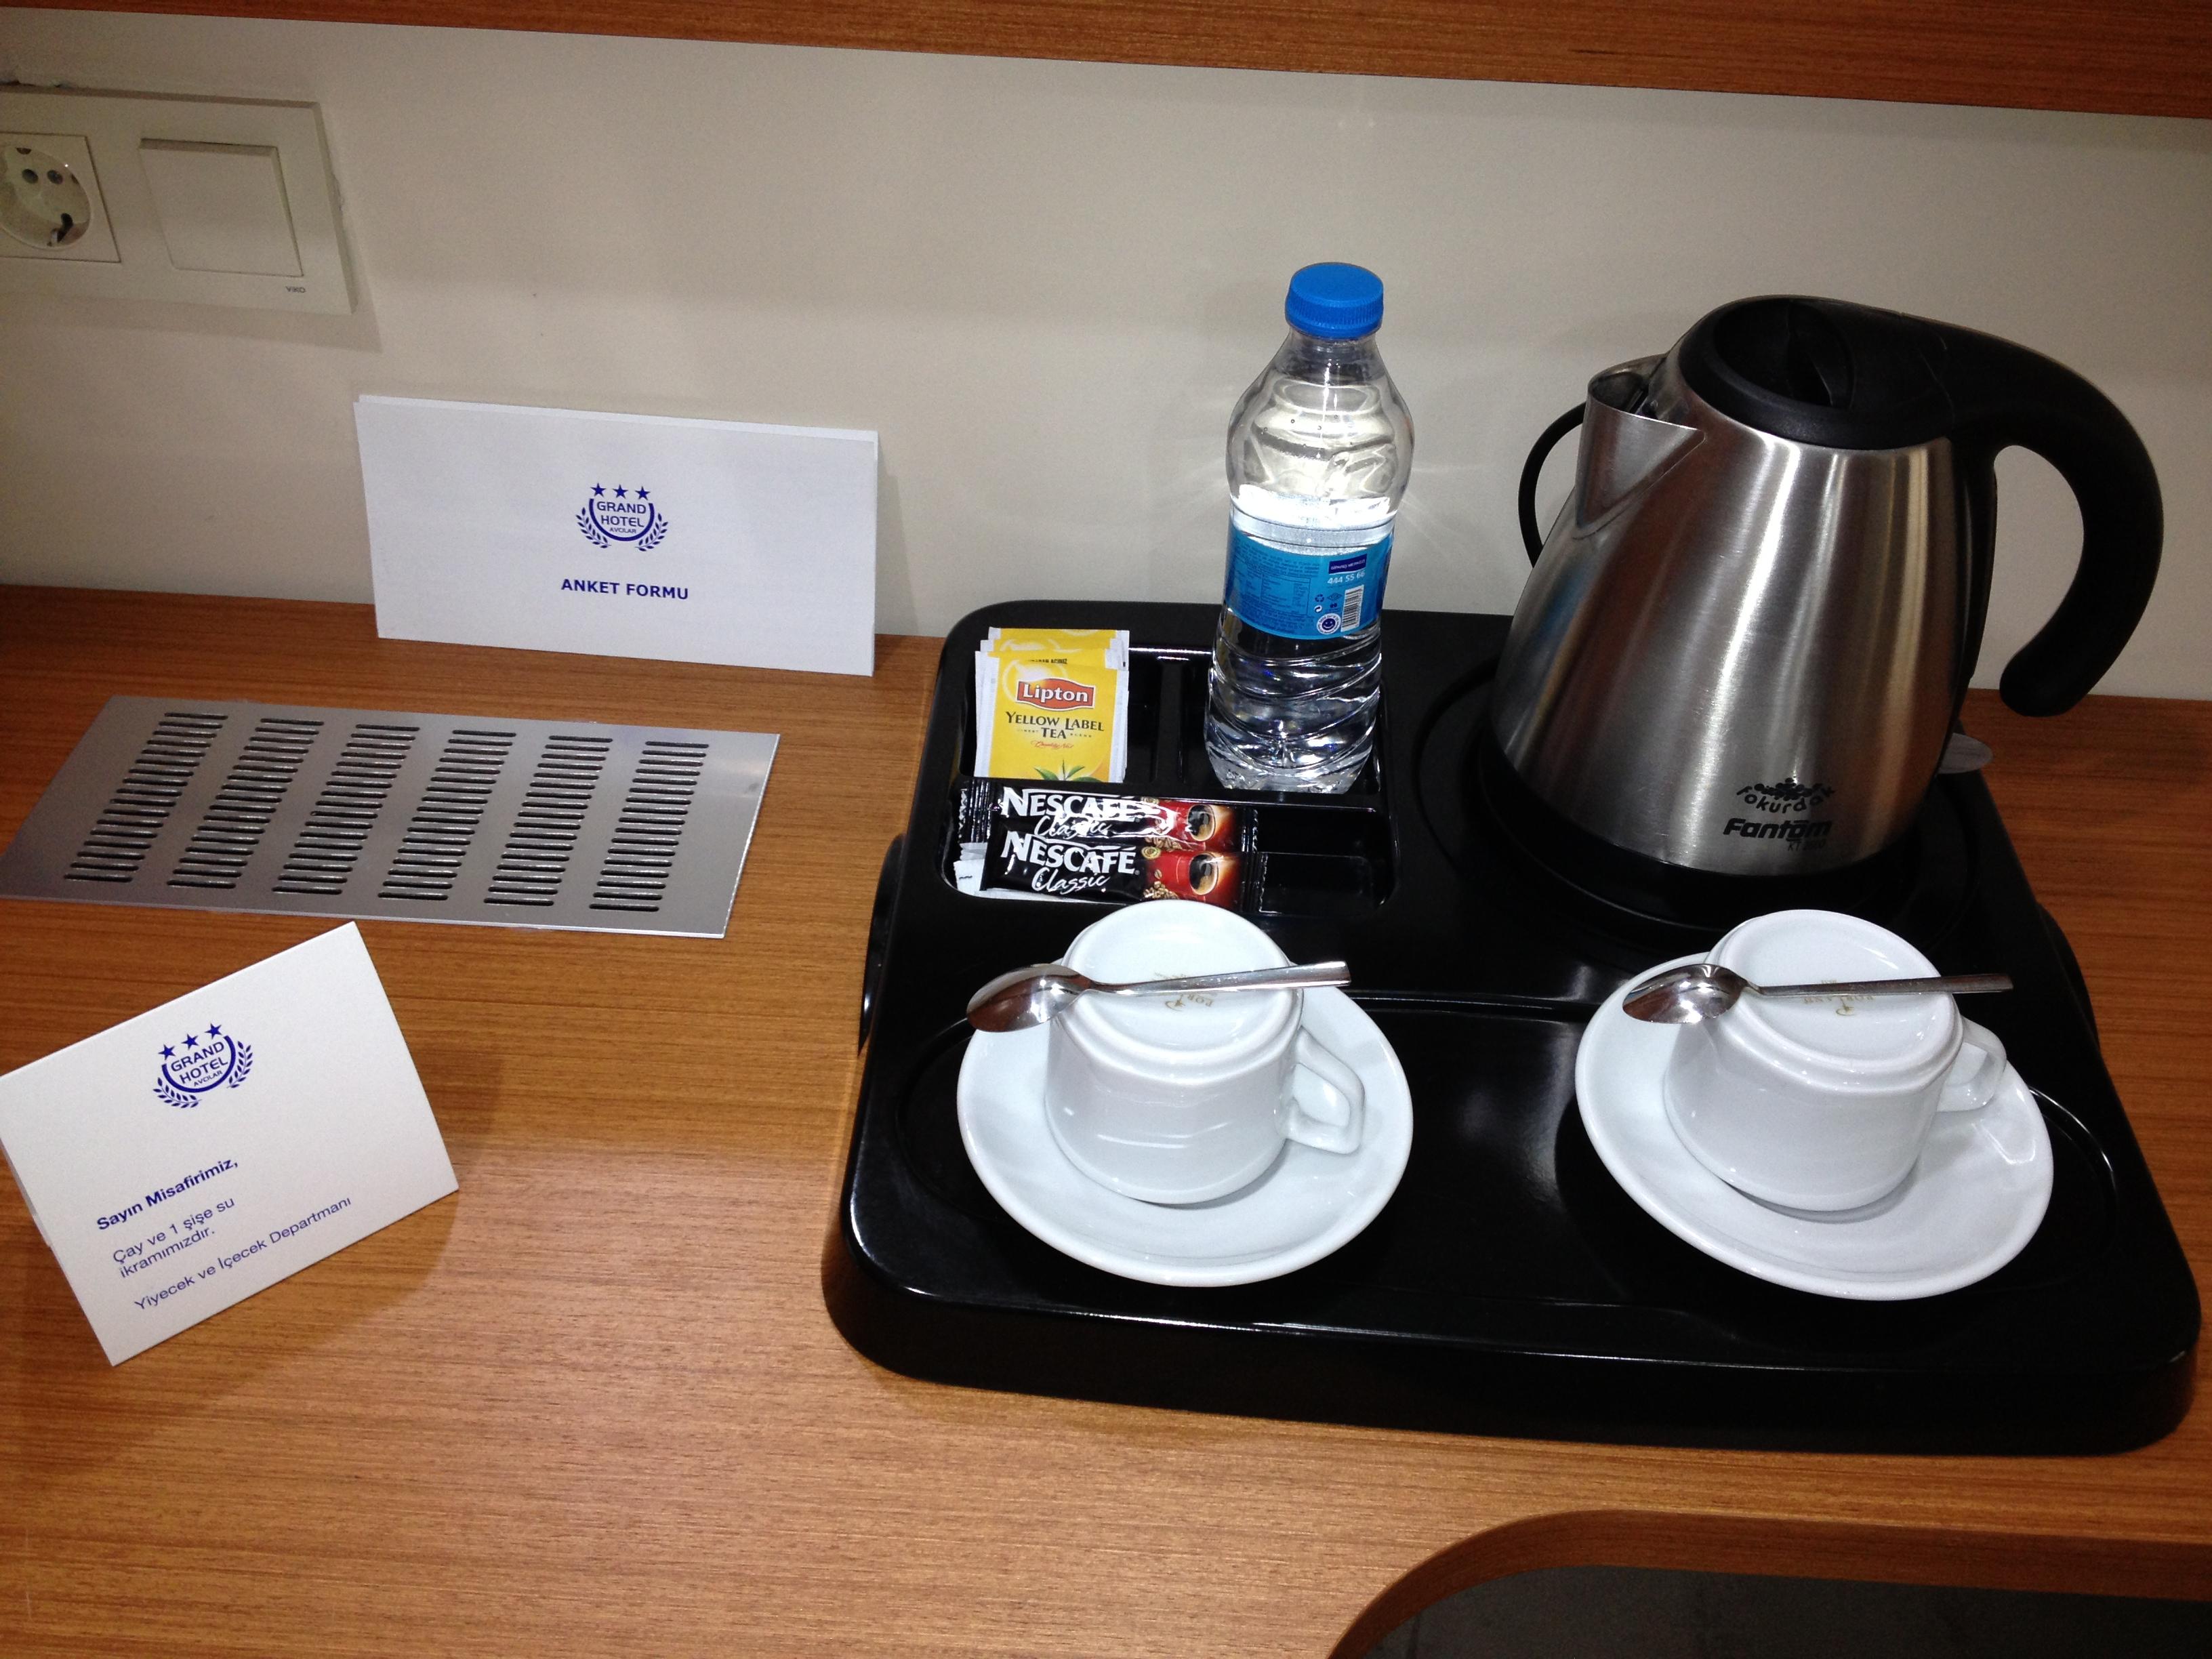 GRAND HOTEL AVCILAR8109